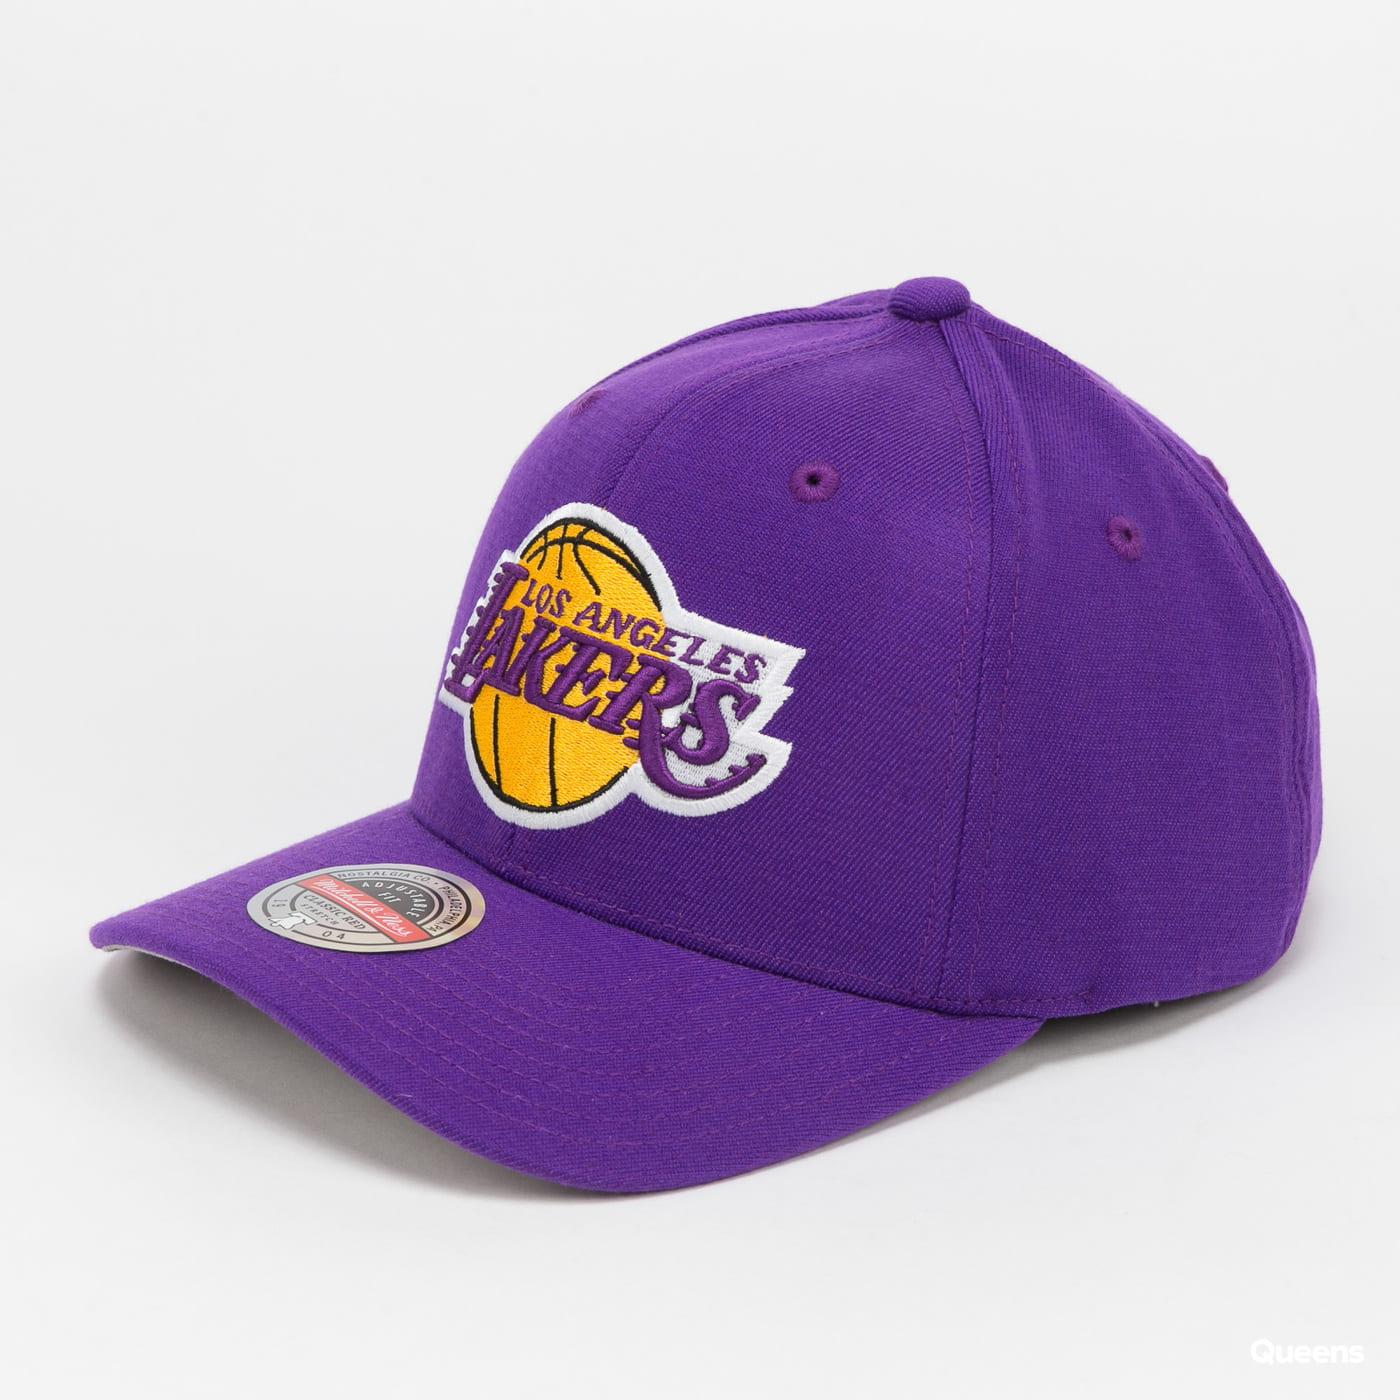 Mitchell & Ness NBA Team Ground Redline Snapback LA Lakers purple / gray